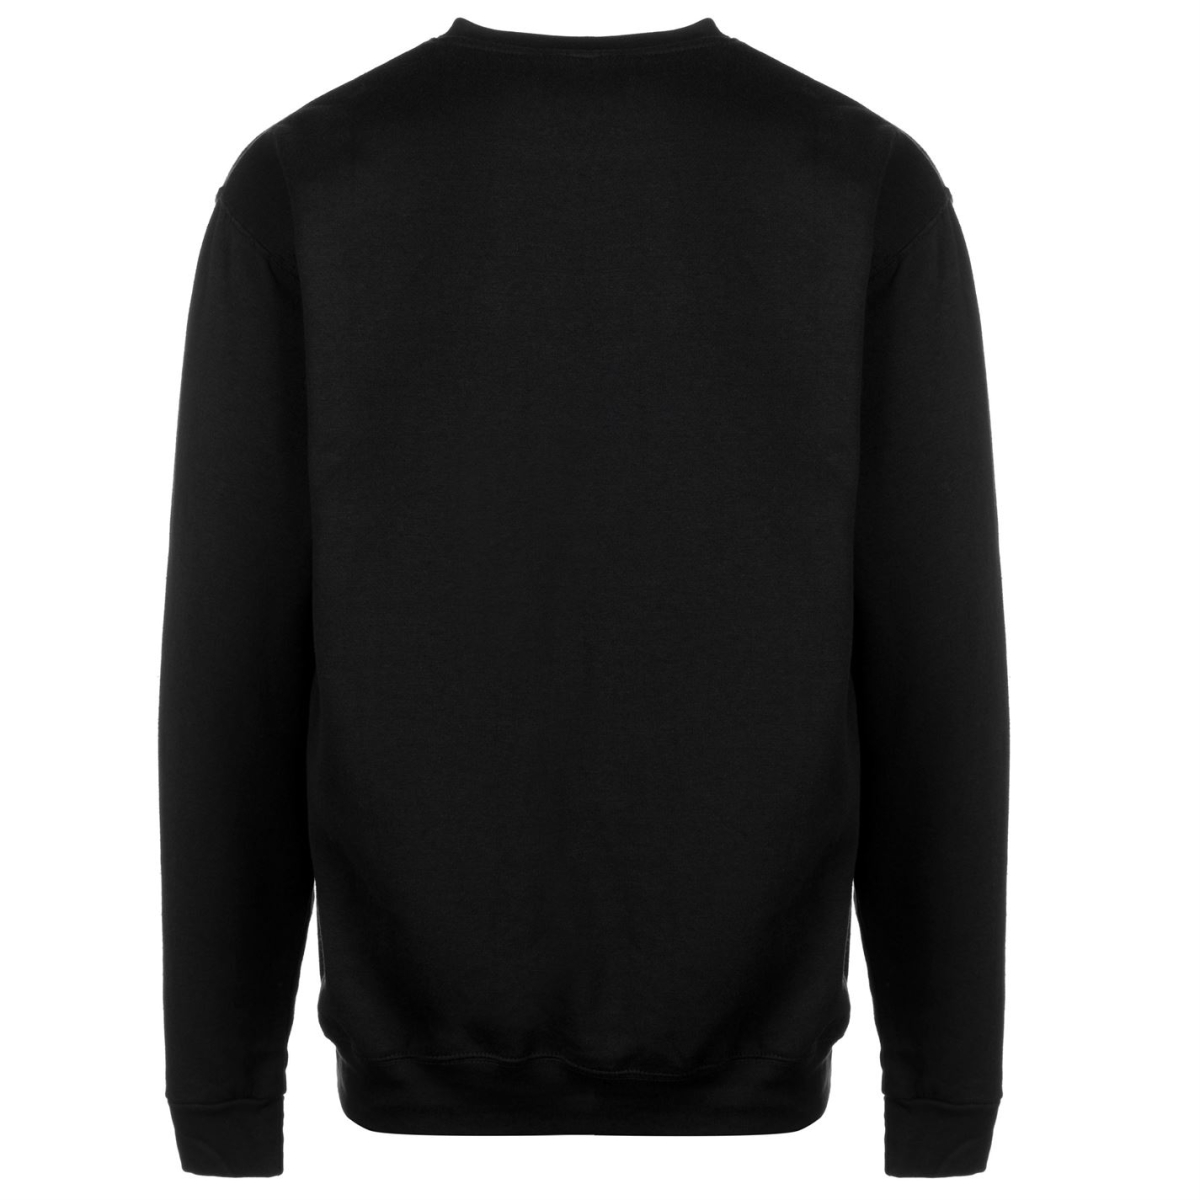 Russell Athletic Herren Sweatshirt Pullover Langarm Rundhalsausschnitt 0087